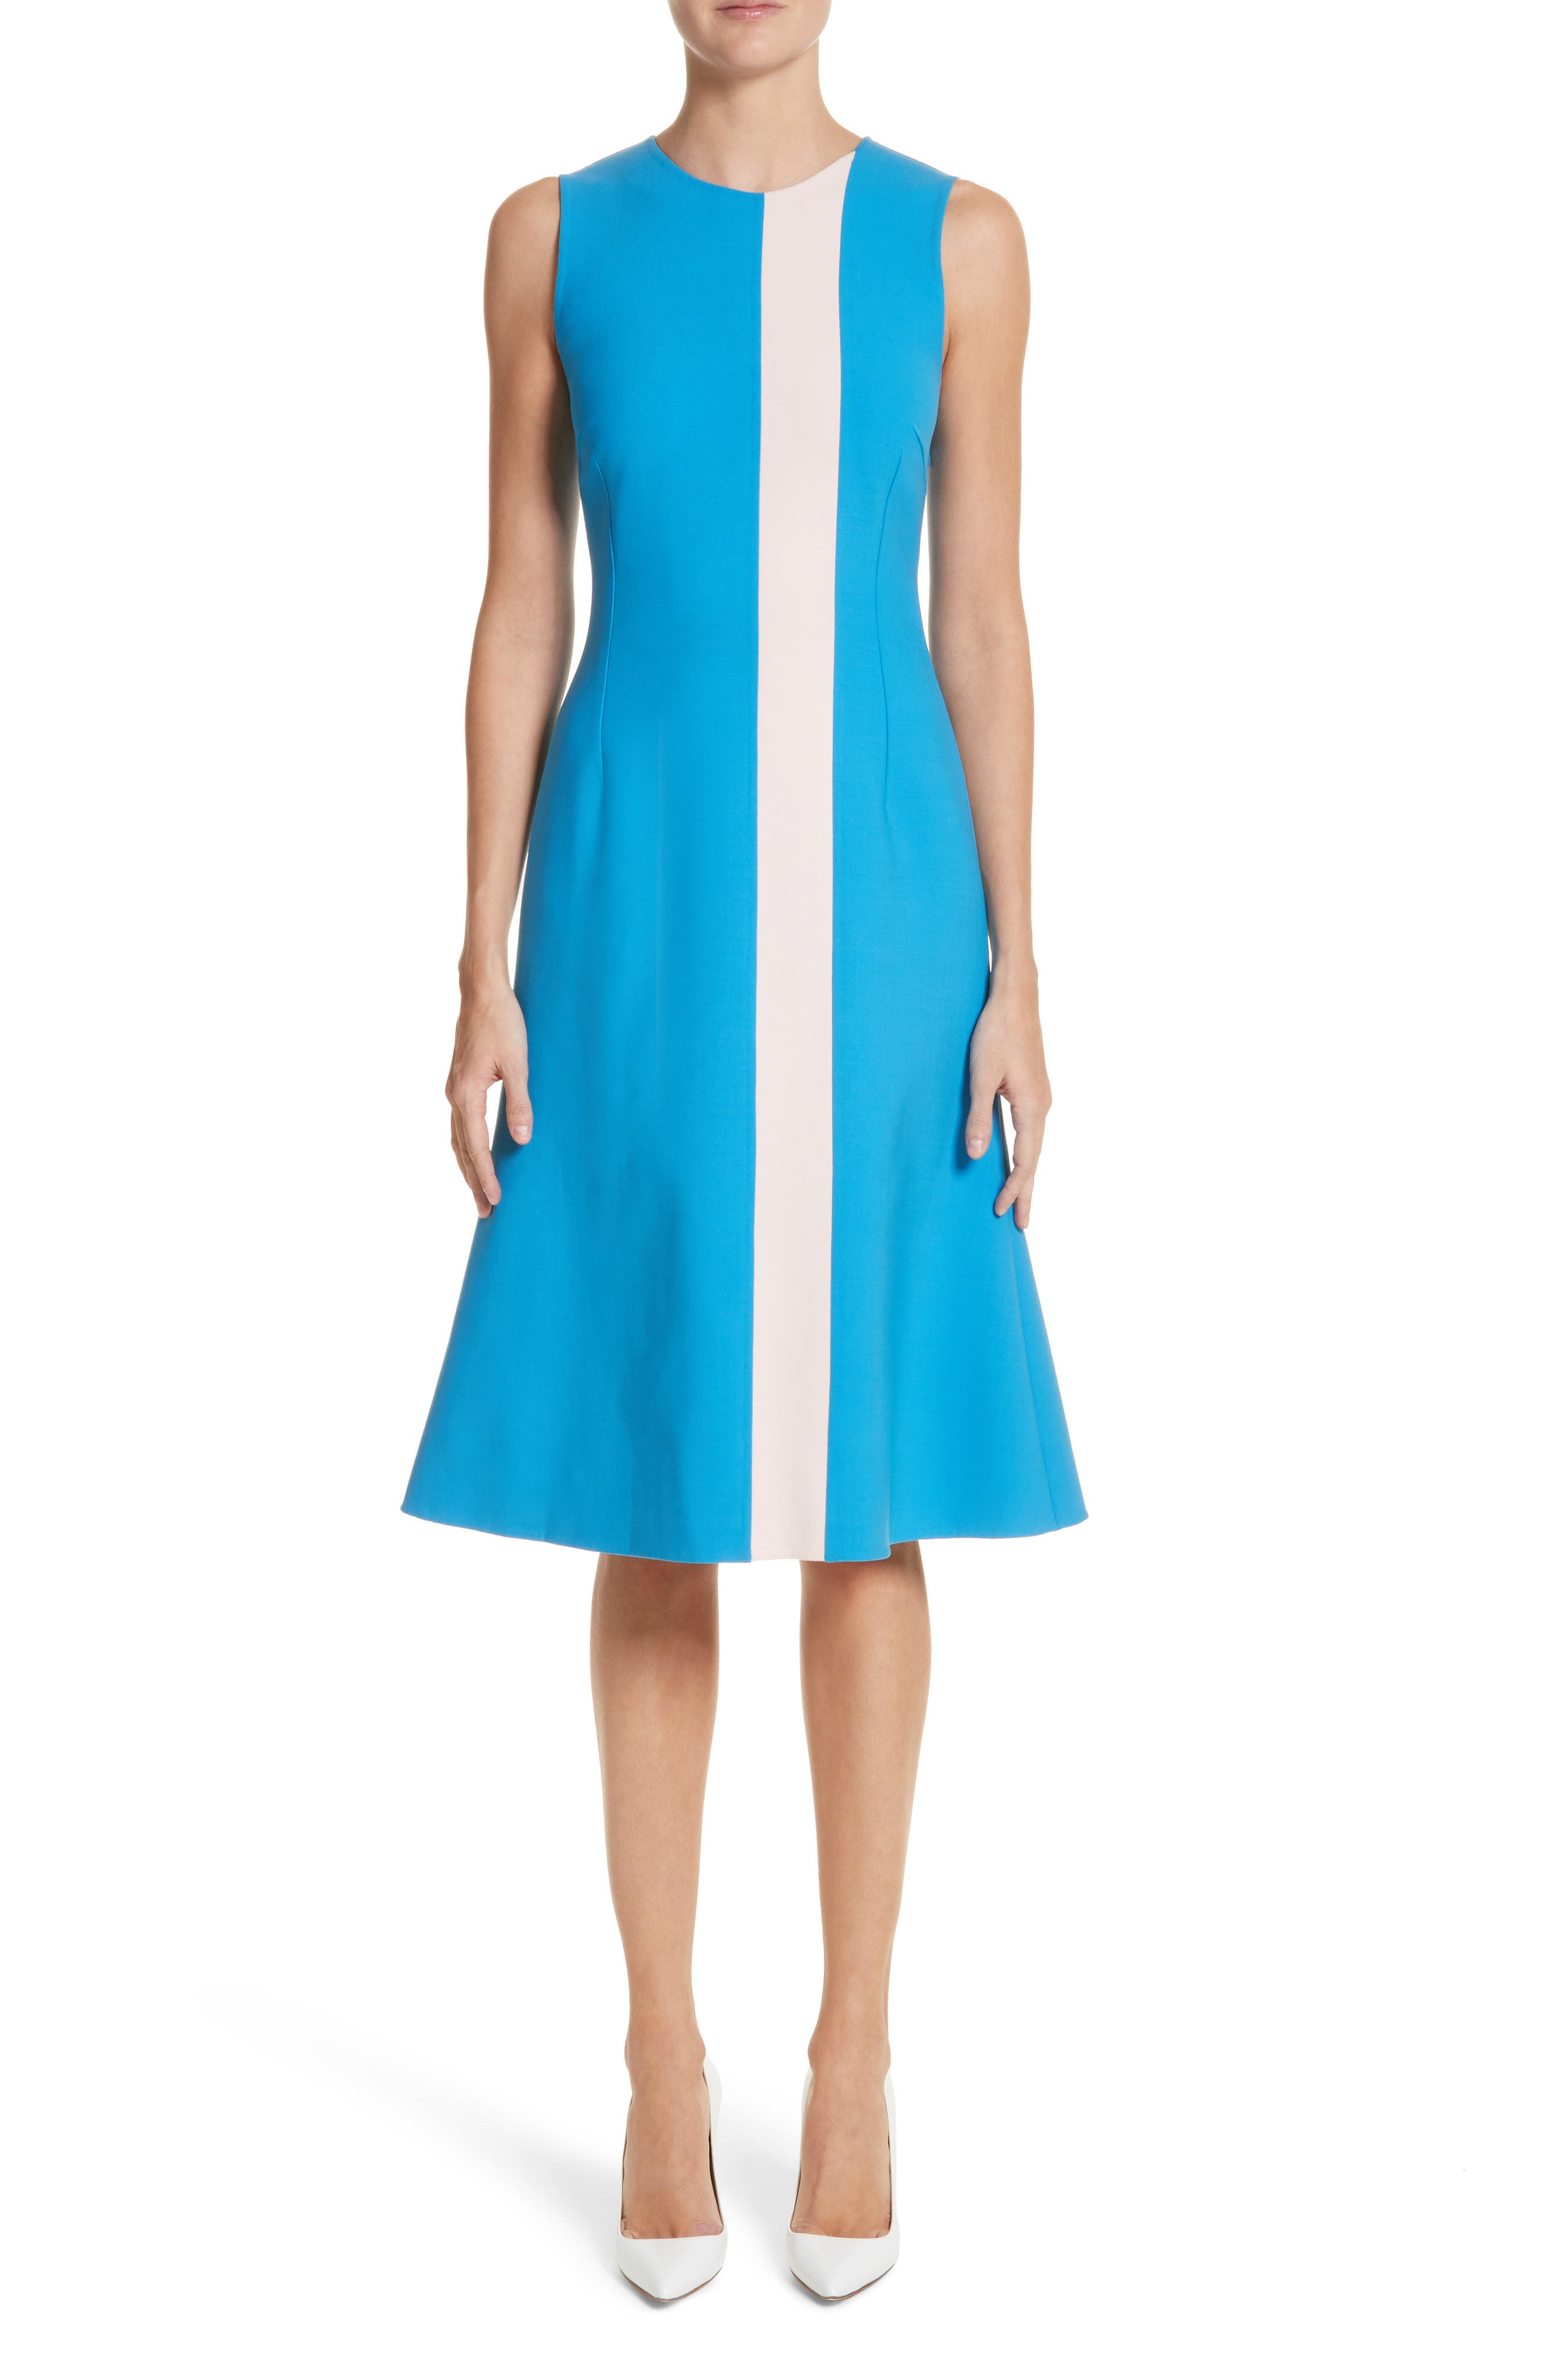 Carolina Herrera Vertical Stripe Dress